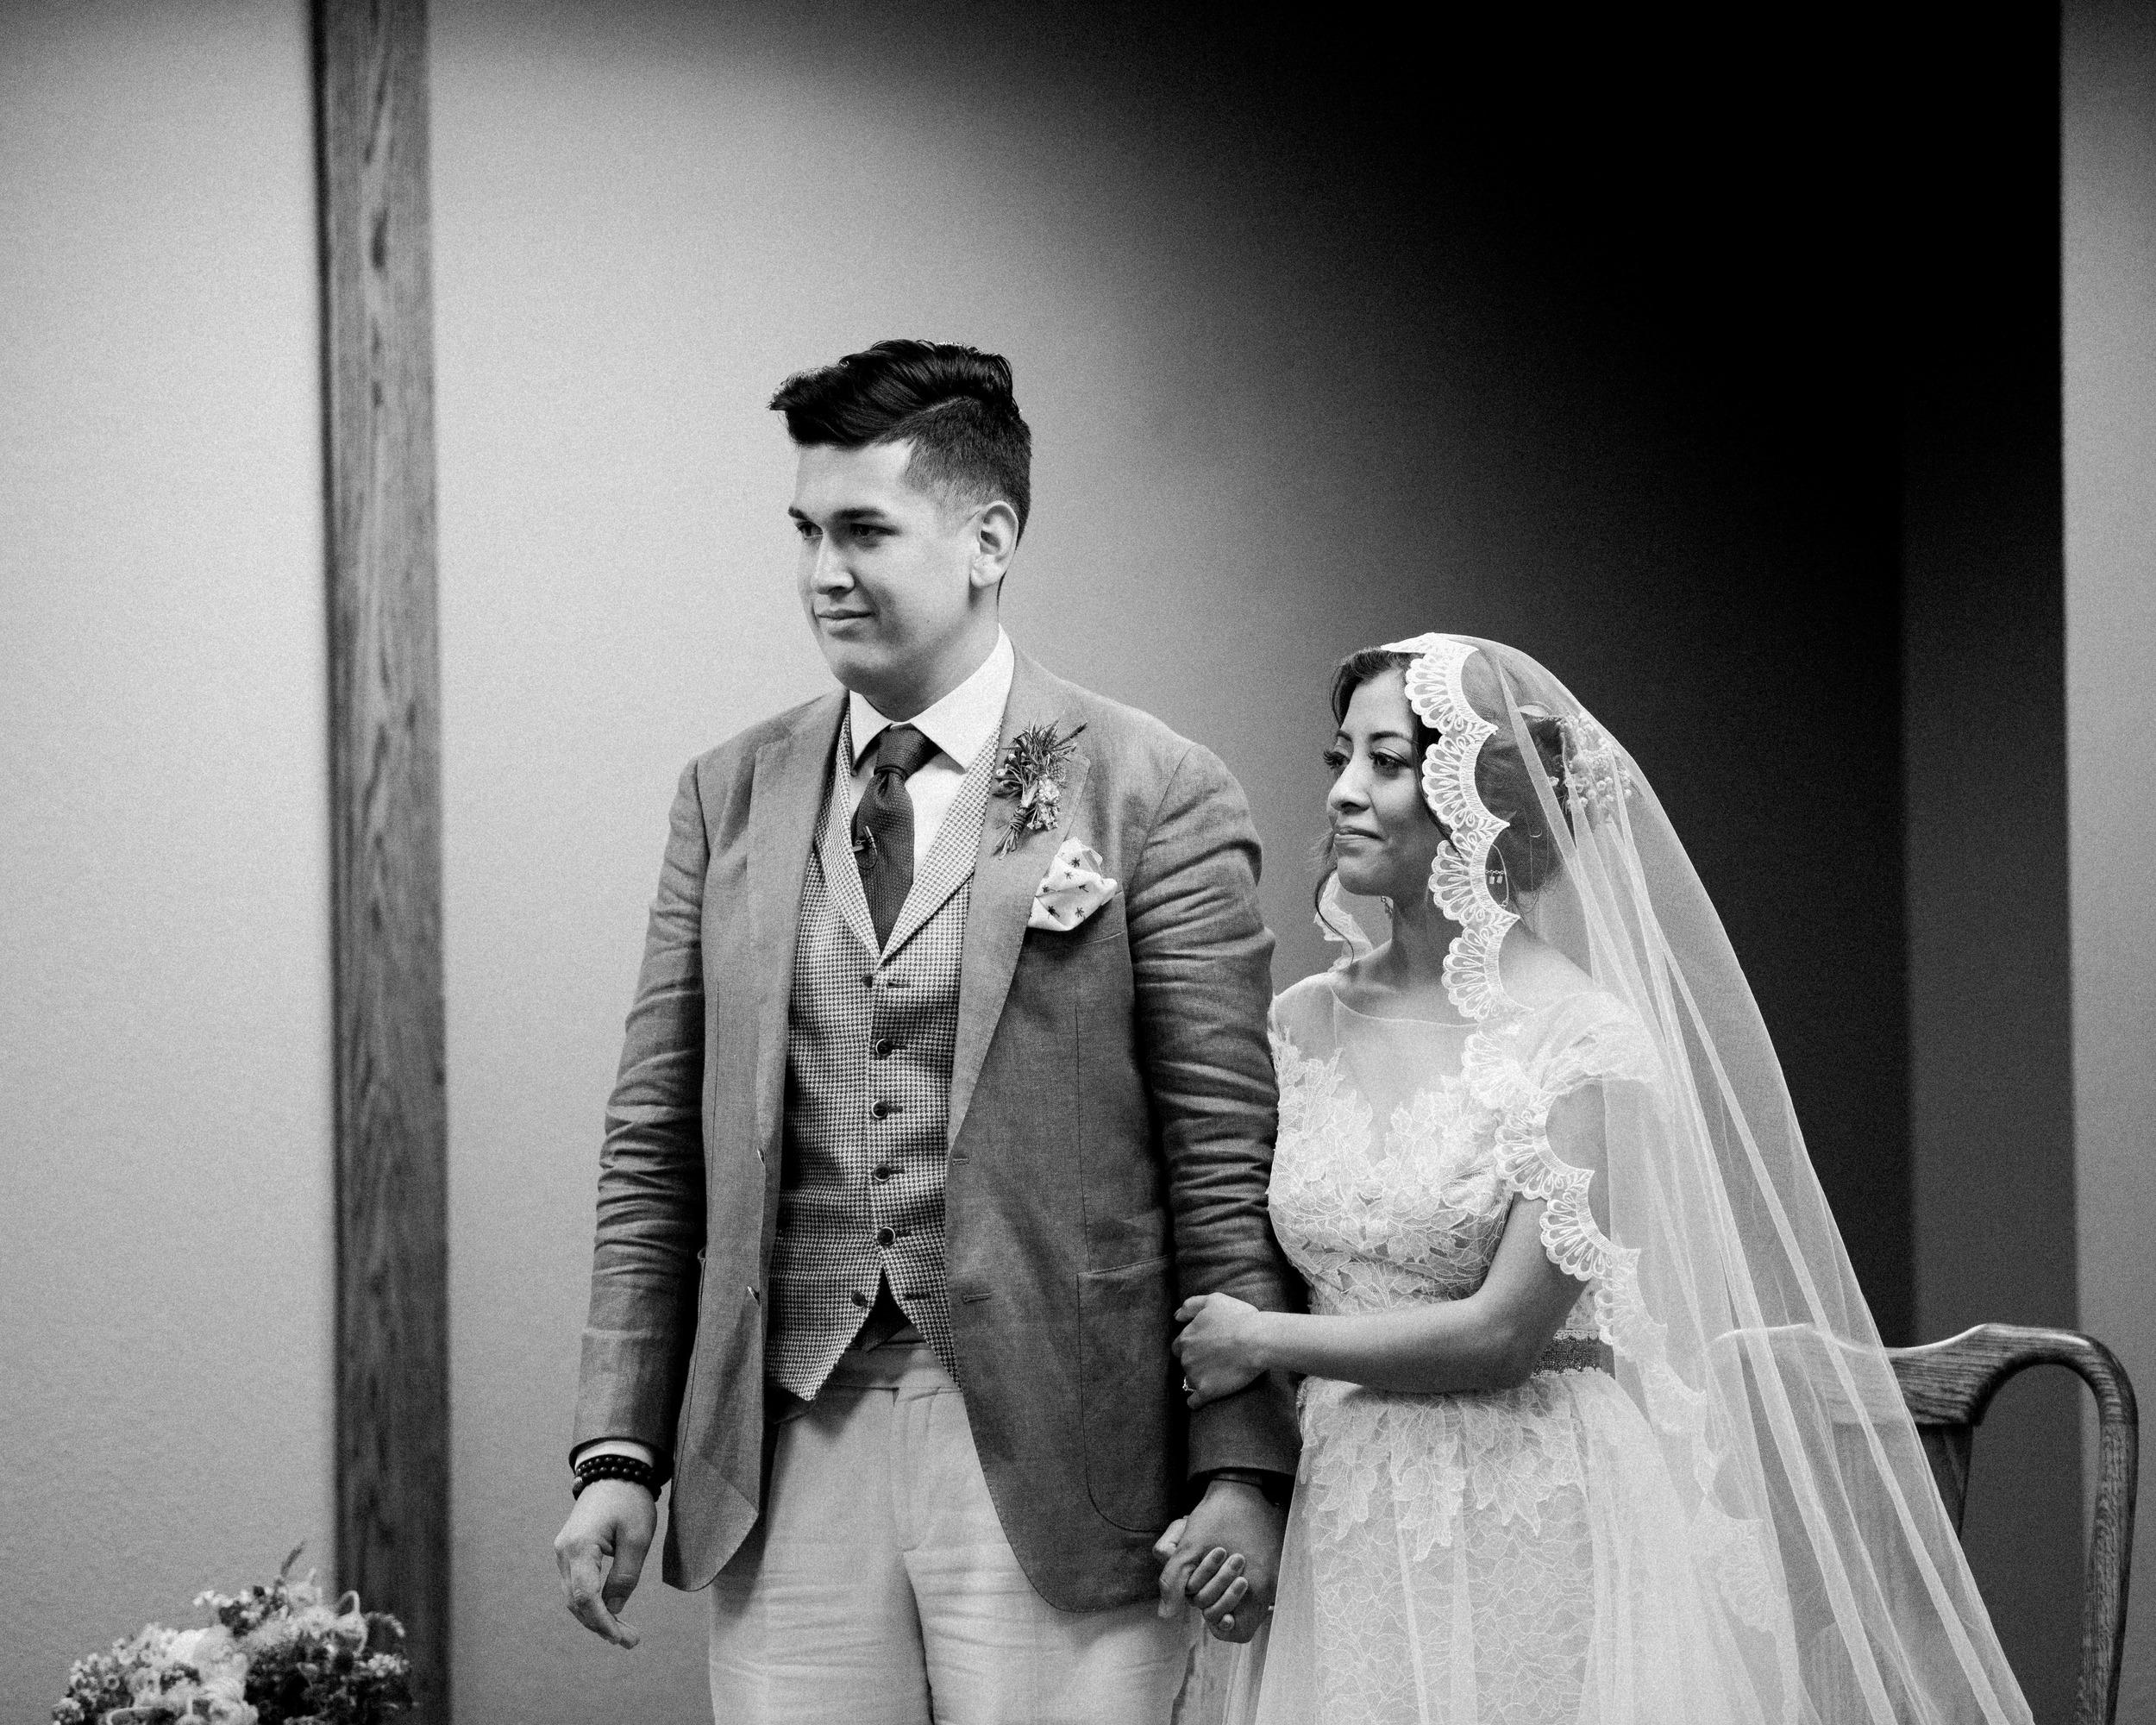 Dana-Fernandez-Photography-Martha-Stewart-Weddings-Houston-Texas-Wedding-Photographer-Film-34.jpg